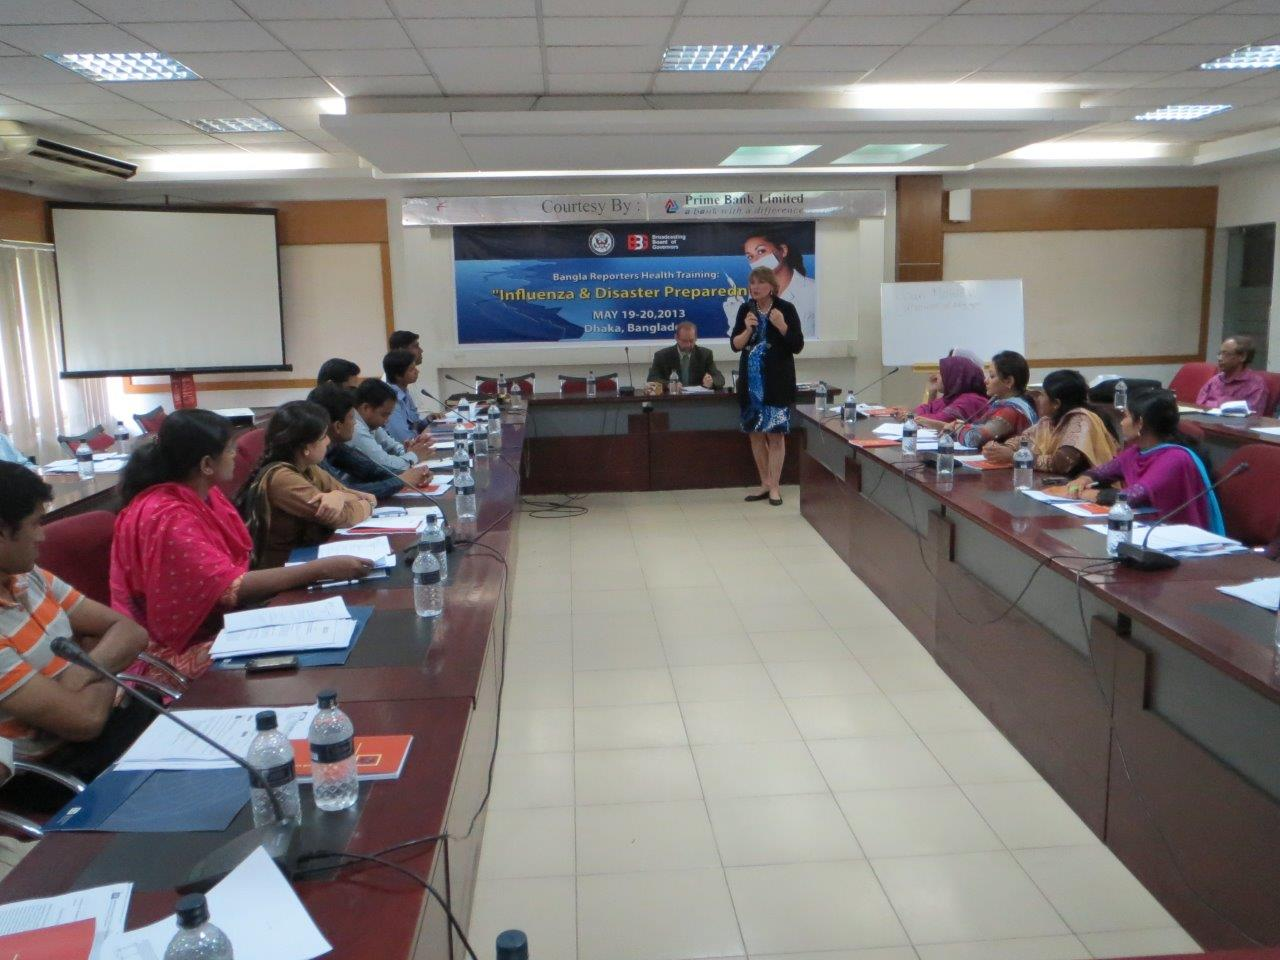 Women lectures a group of participants